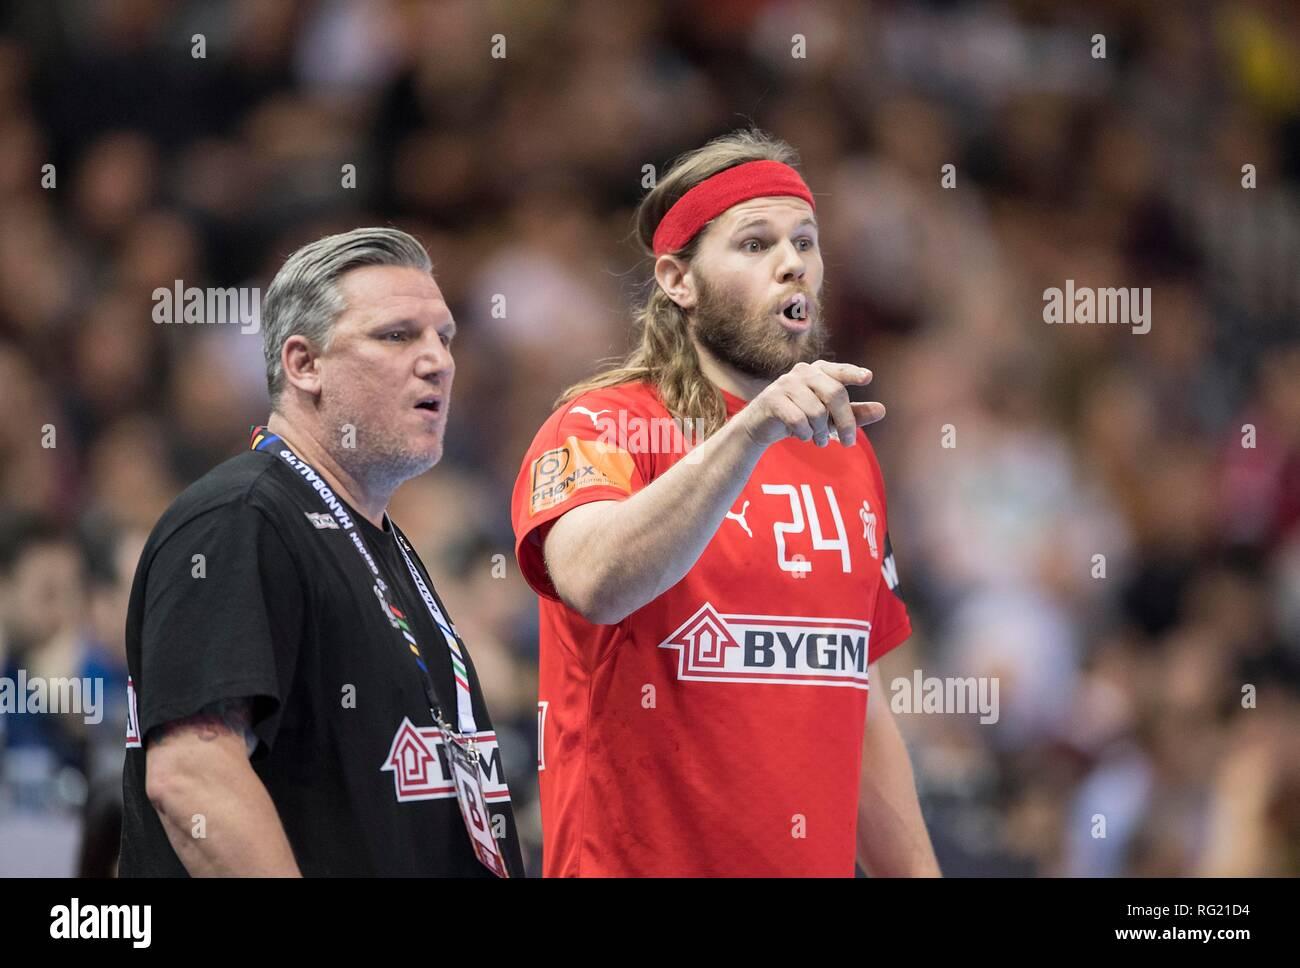 Hamburg, Deutschland. 25th Jan, 2019. coach Nikolaj JACOBSEN l. (DEN) with Mikkel HANSEN (DEN). Semifinals France (FRA) - Denmark (DEN), on 25/01/2019 in Hamburg/Germany. Handball World Cup 2019, from 10.01. - 27.01.2019 in Germany/Denmark.   usage worldwide Credit: dpa/Alamy Live News Stock Photo